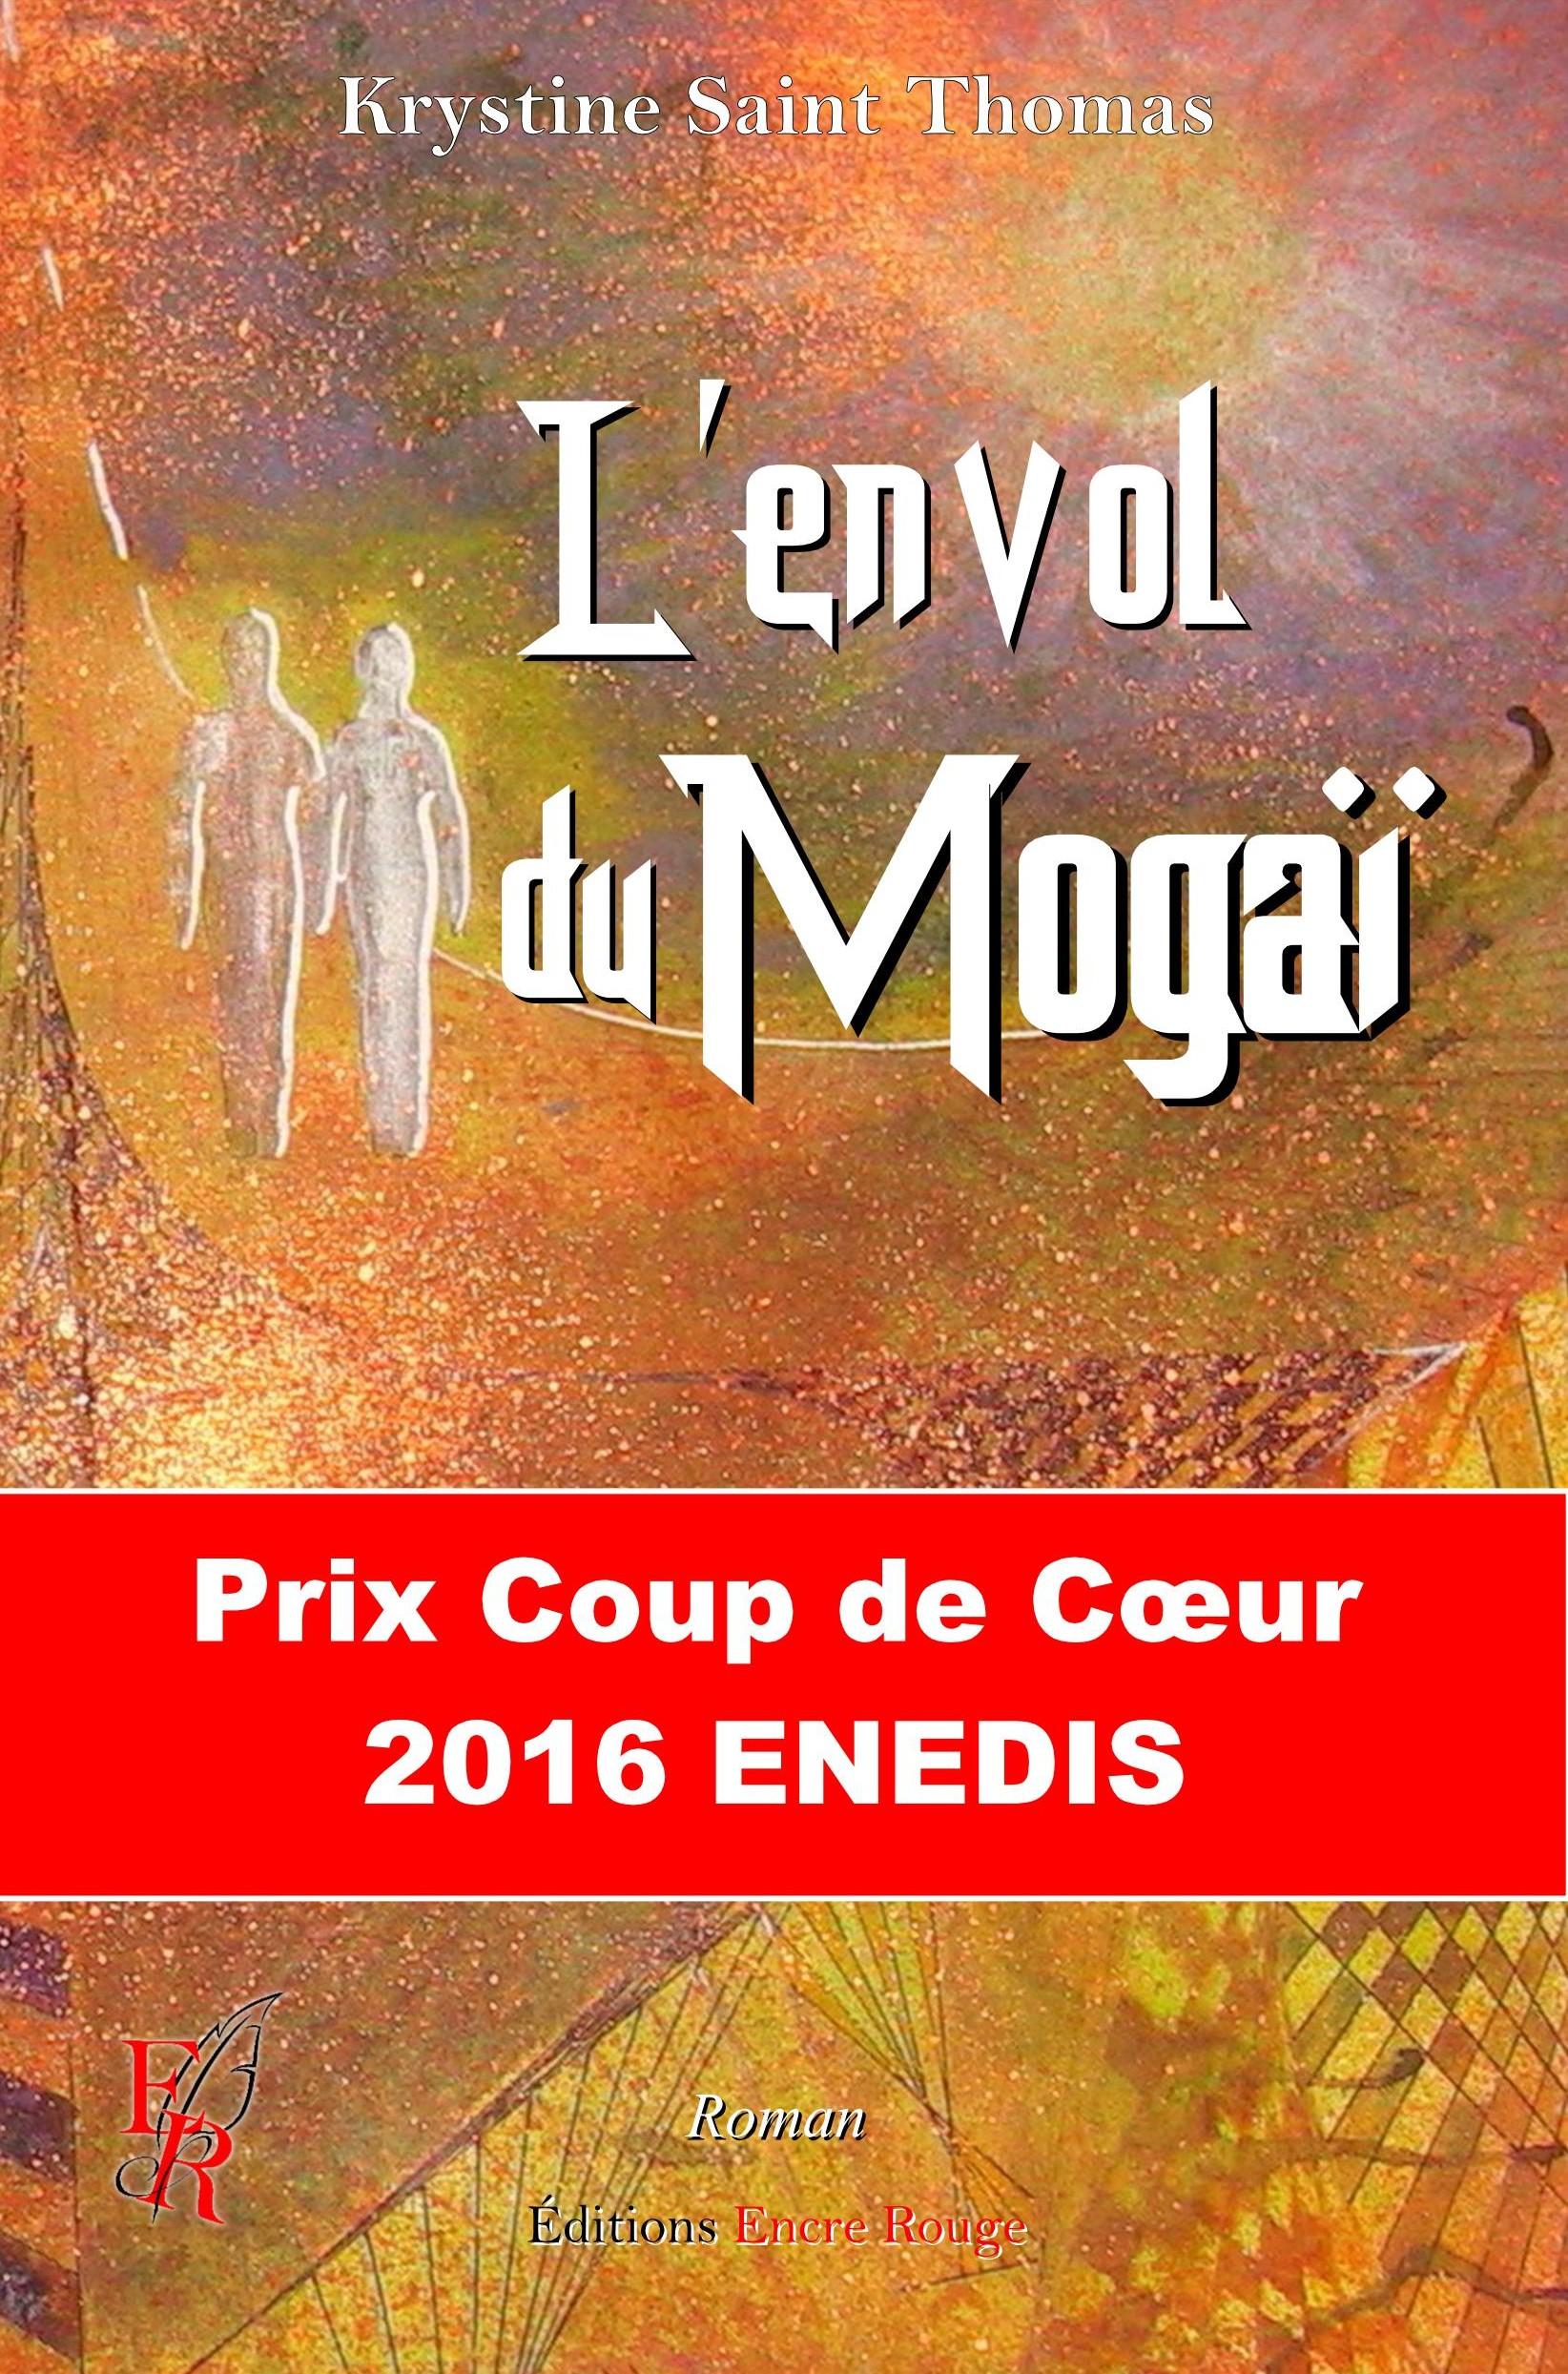 L'envol du Mogaï, Prix Coup de Cœur 2016 Enedis